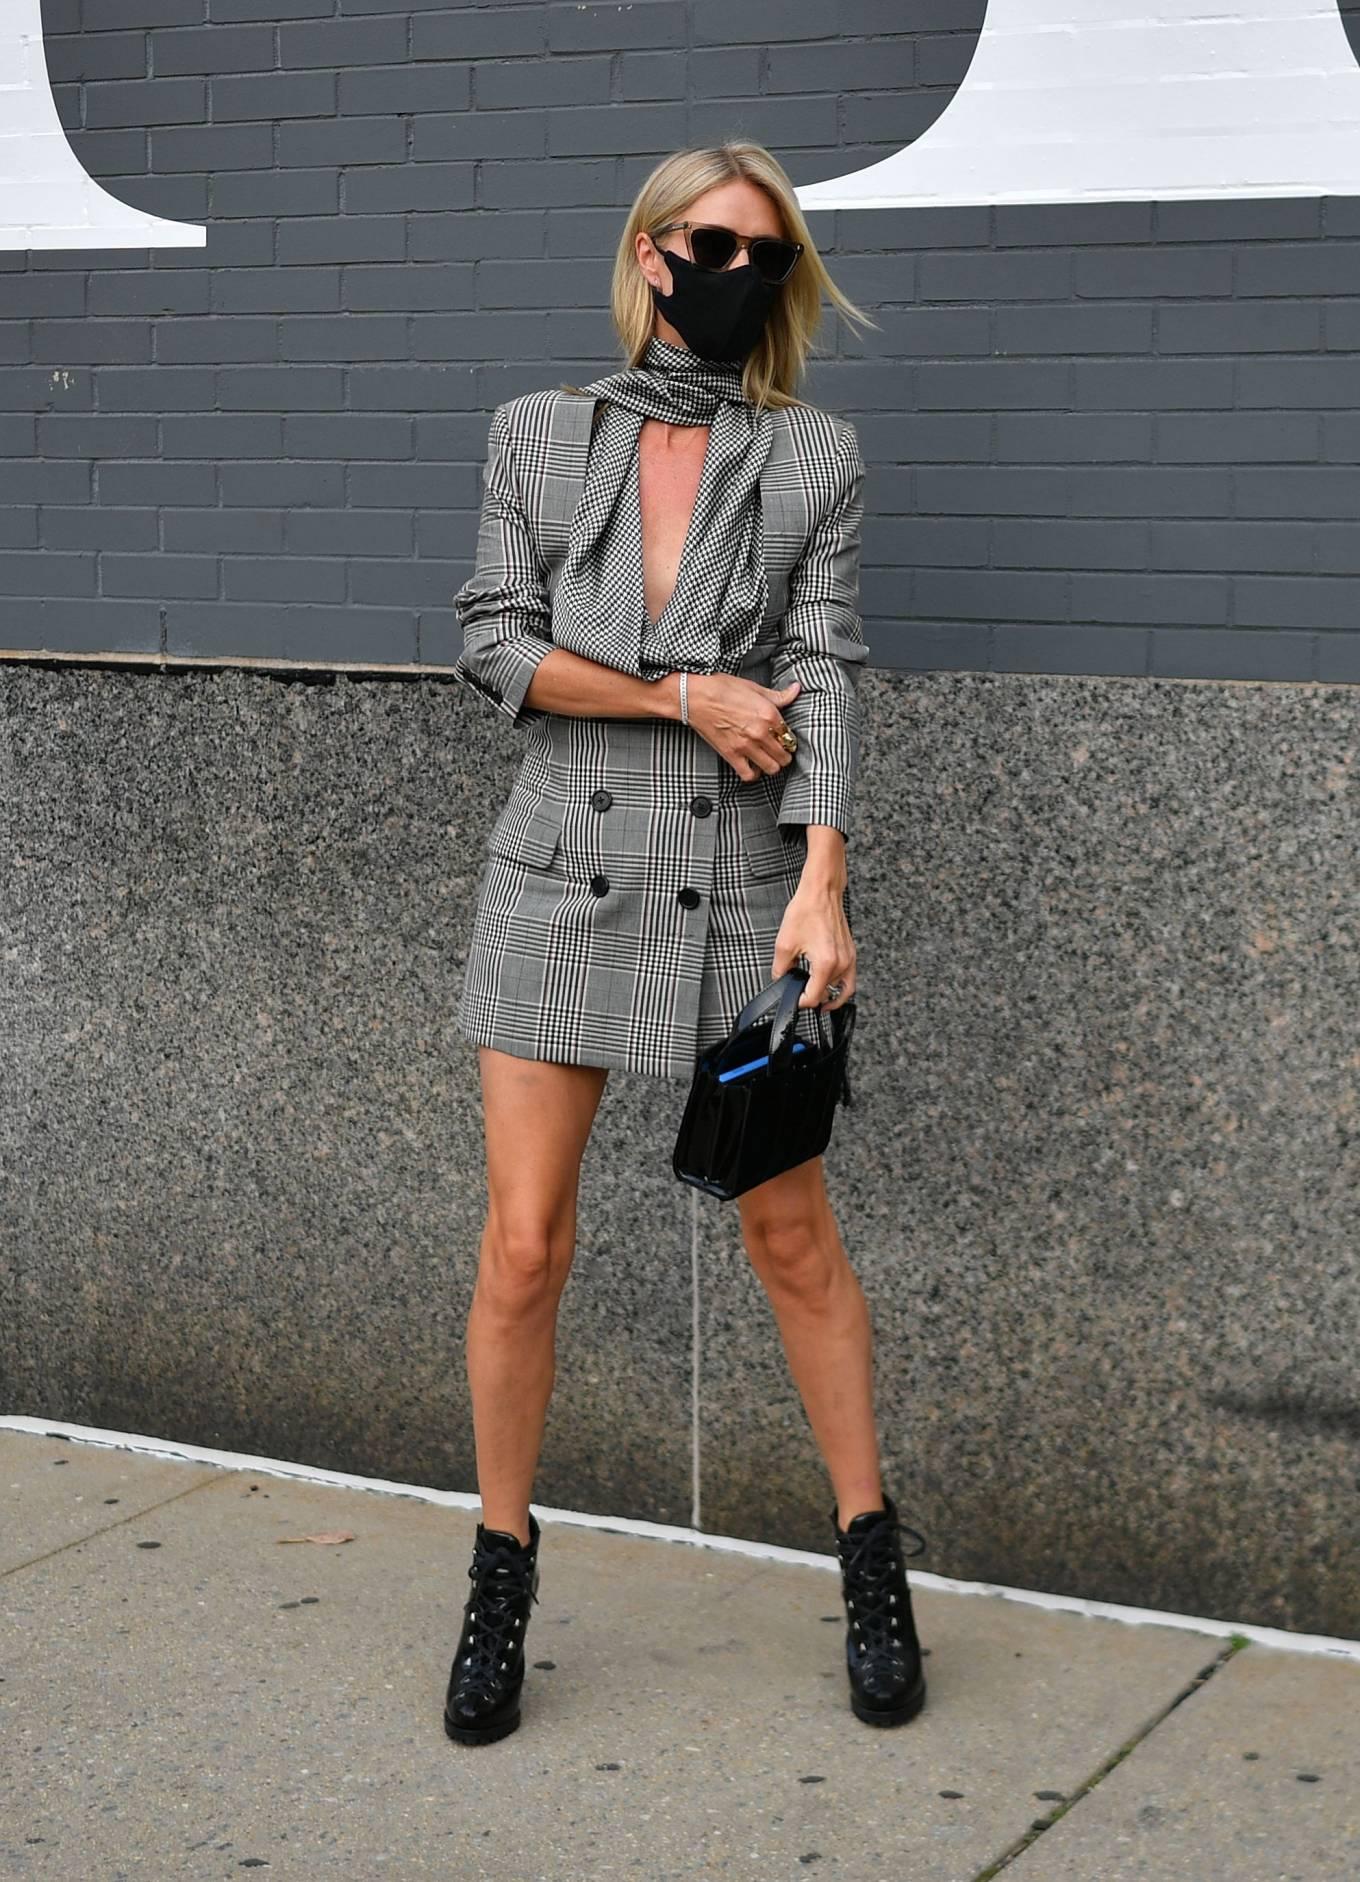 Nicky Hilton 2020 : Nicky Hilton – New York Fashion Week – Monse Fall-Winter 2020 Presentation-36